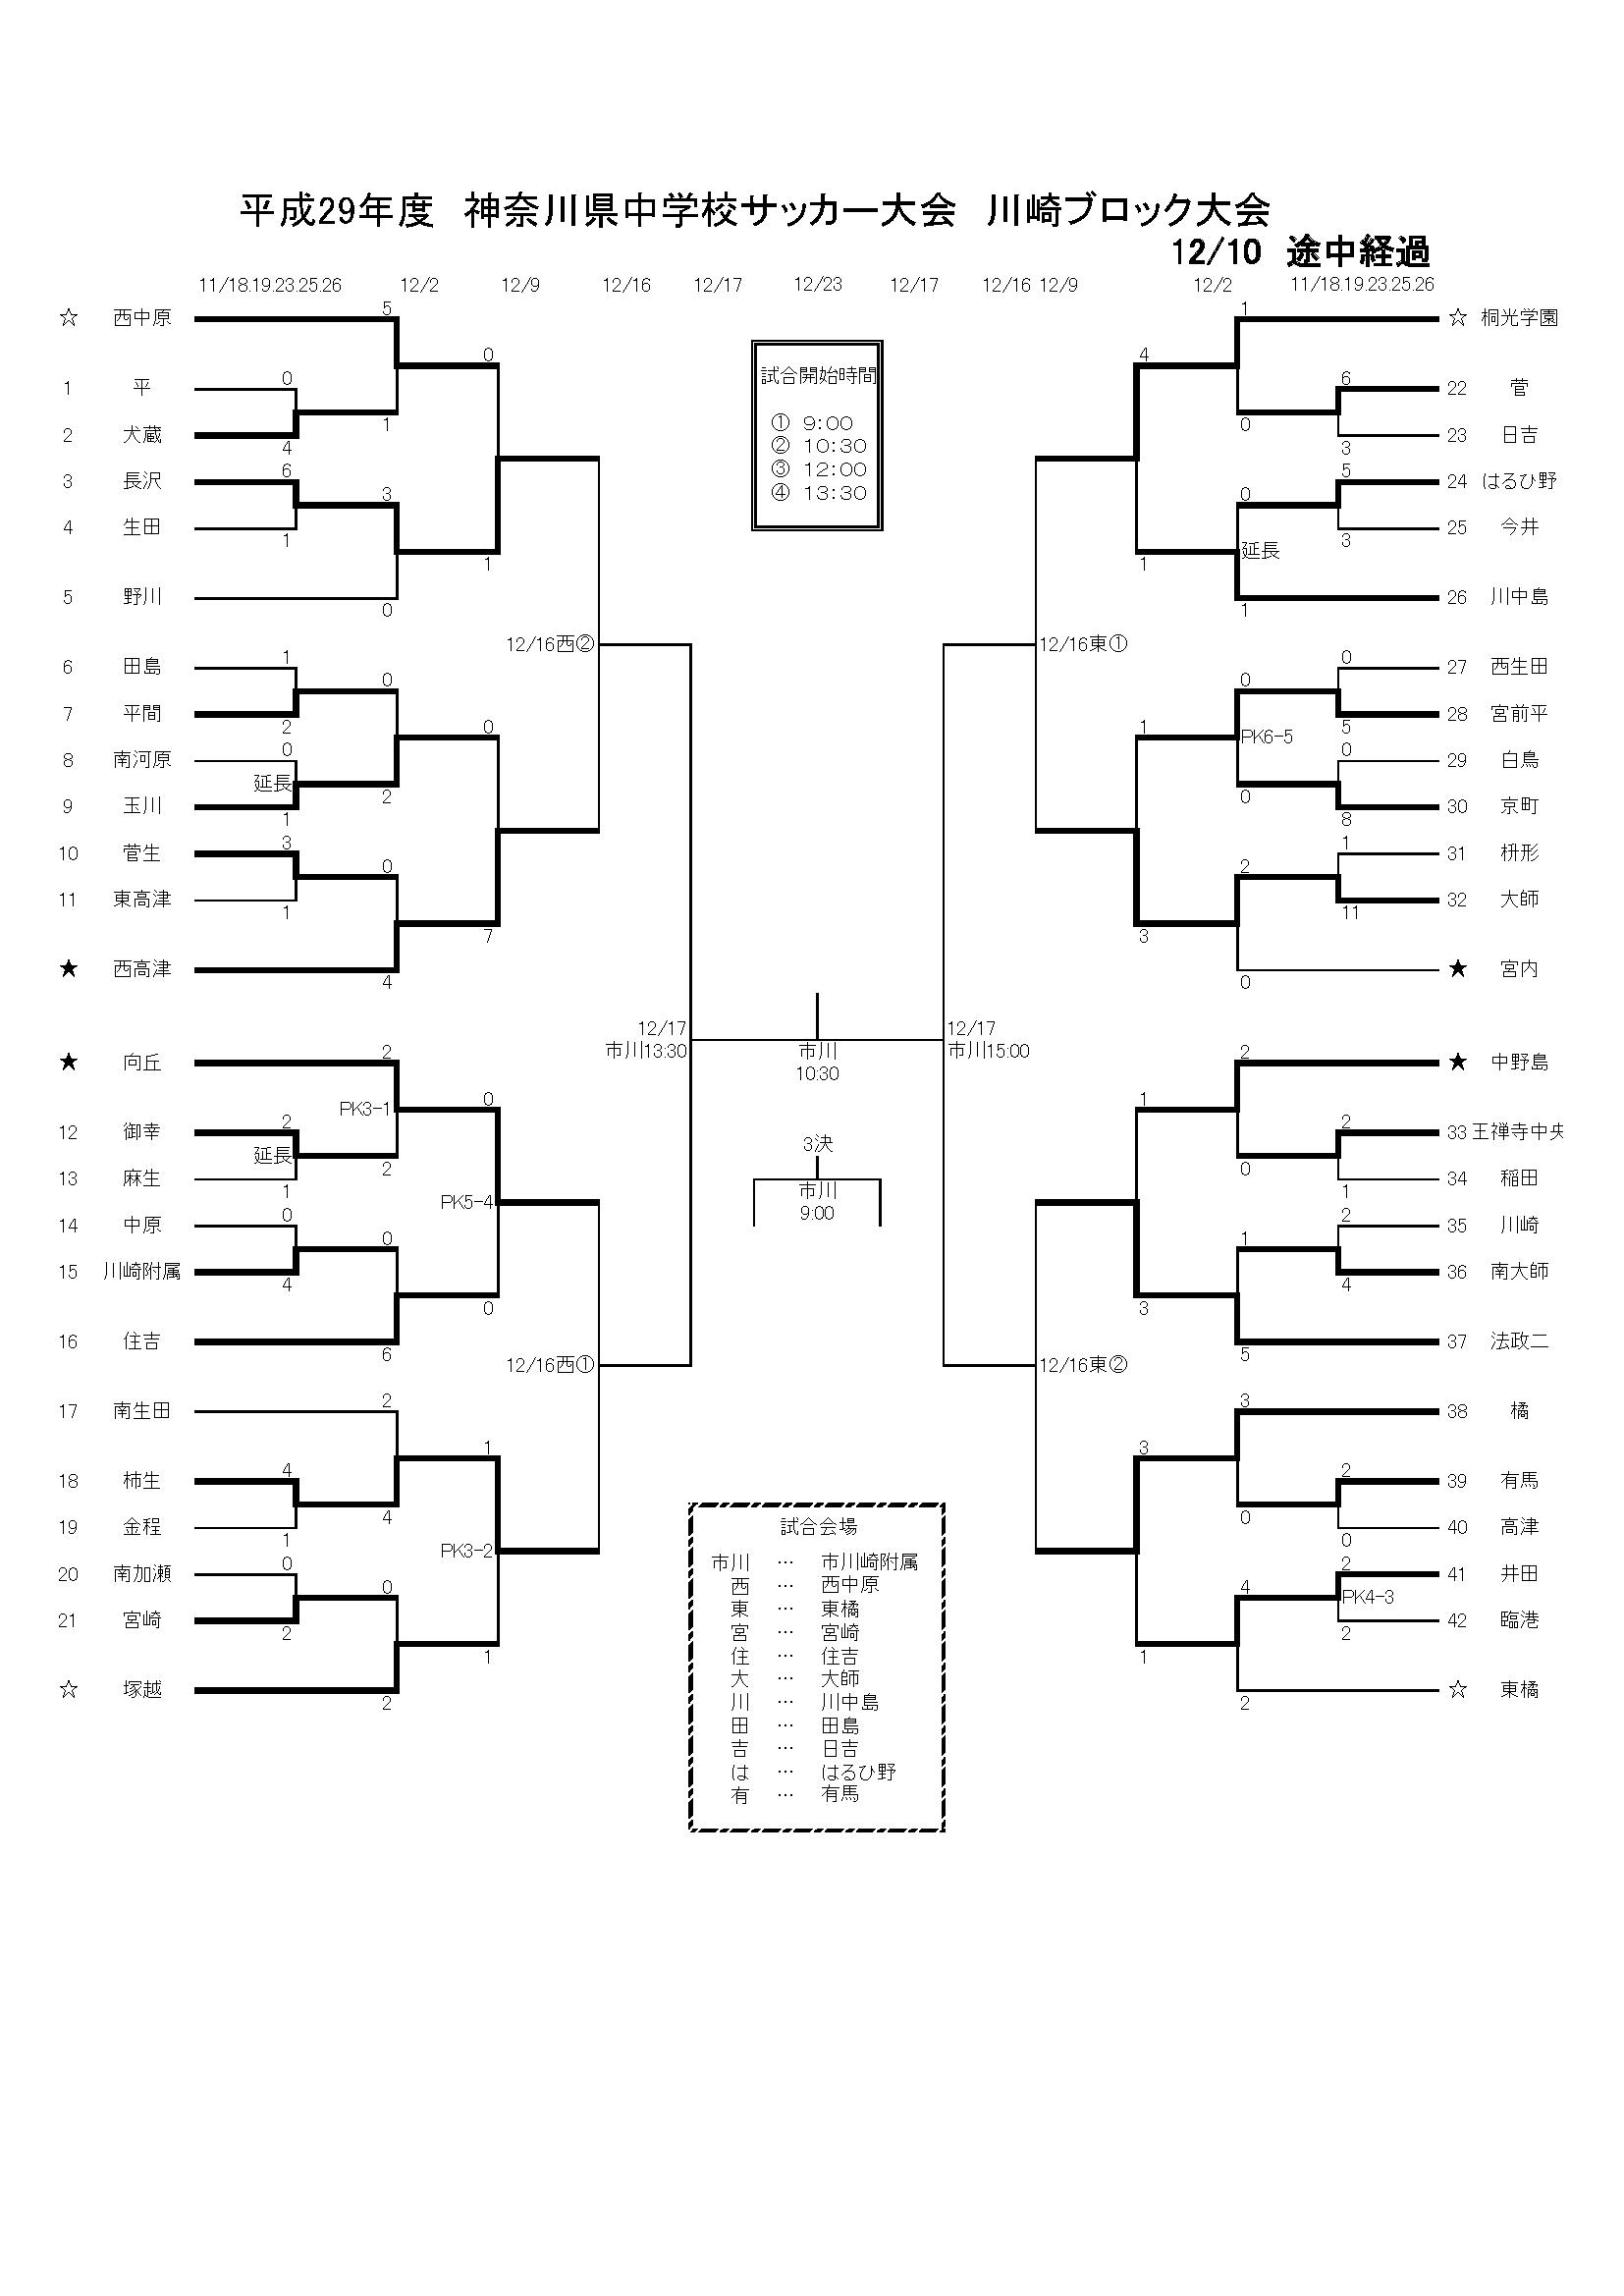 H29 新人戦準々決勝